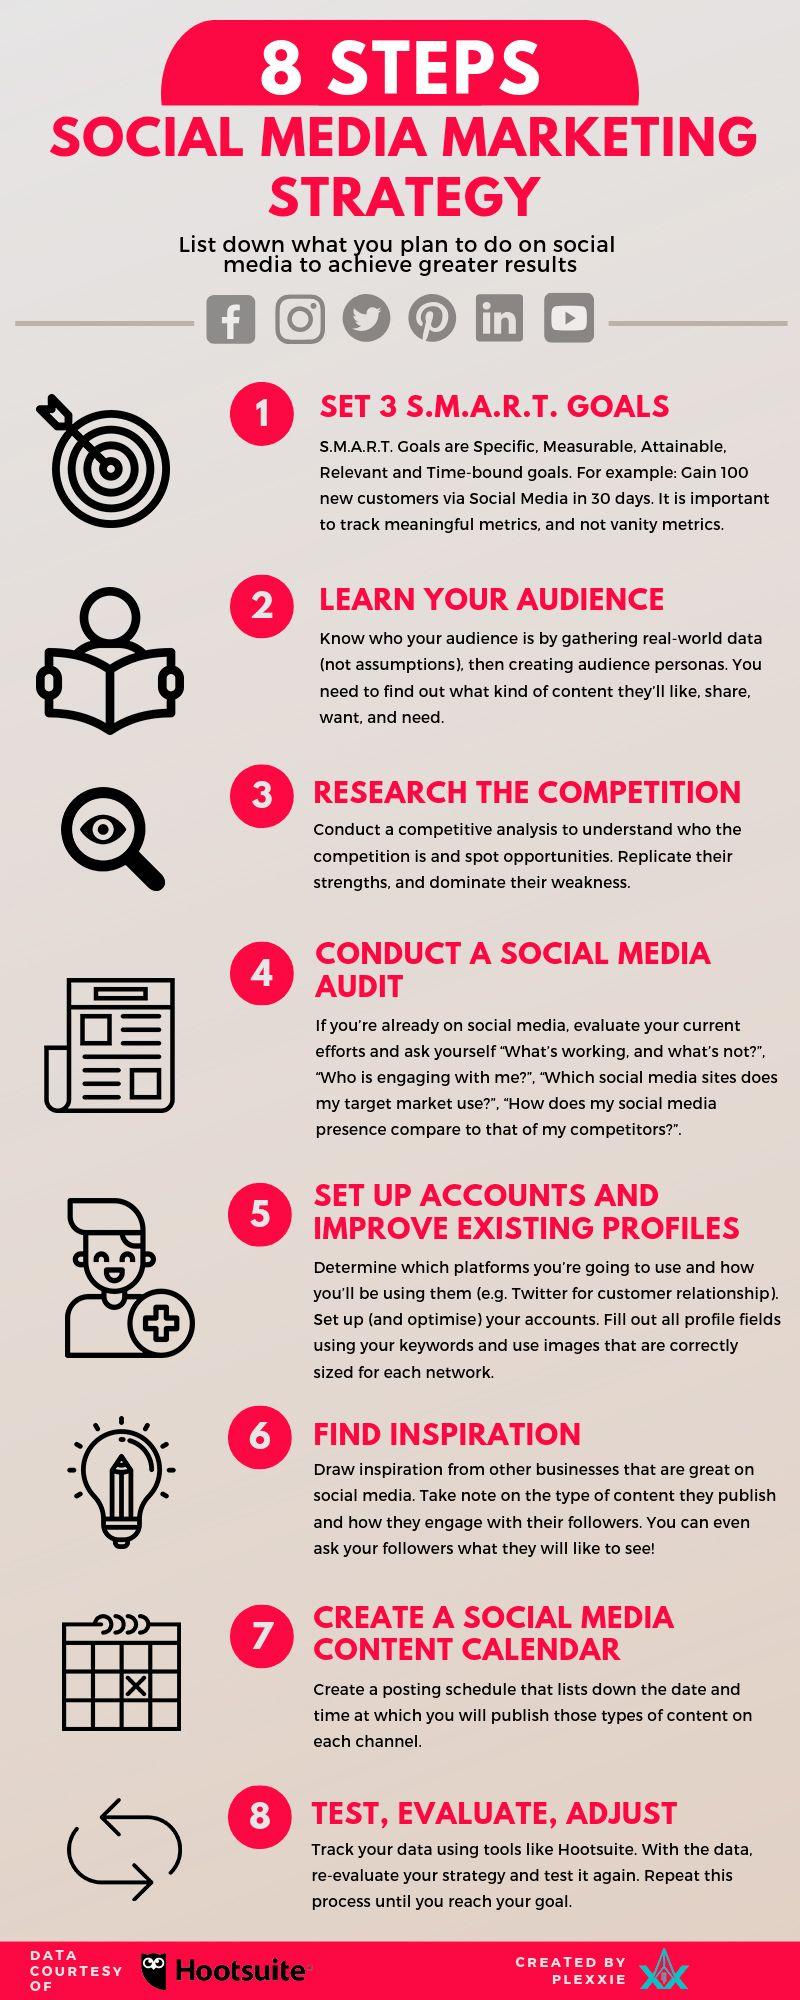 8 Step Social Media Marketing Strategy To Make You Look Awesome Online Social Media Marketing Plan Marketing Strategy Infographic Social Media Marketing Business